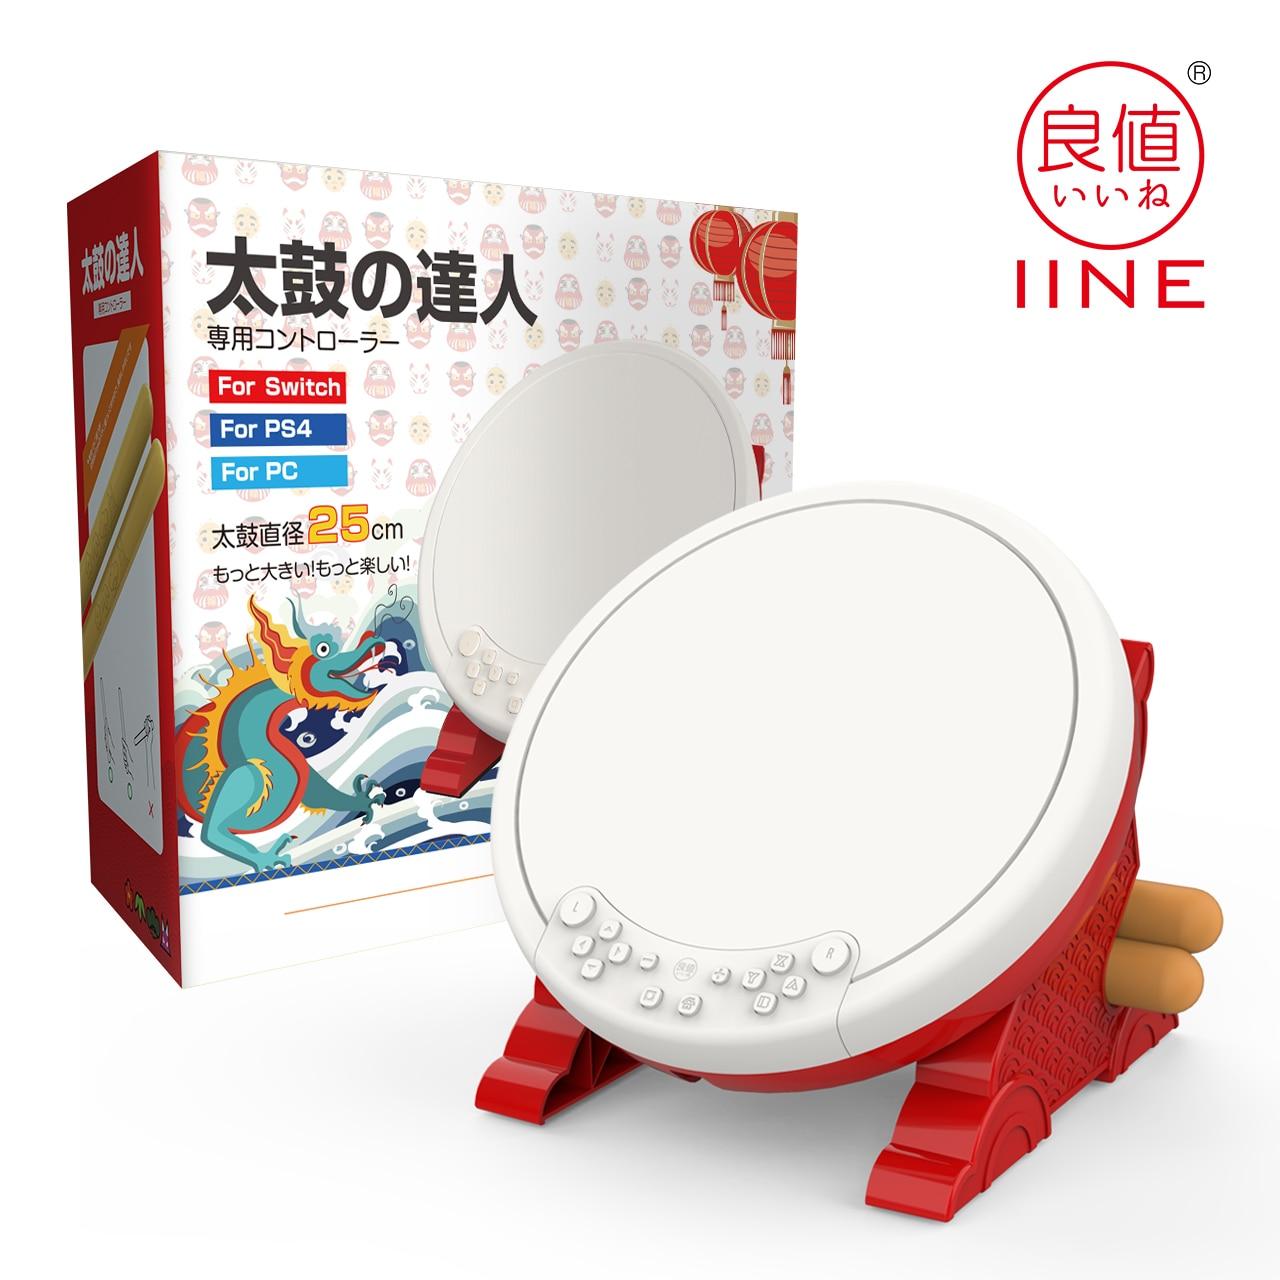 AliExpress - IINE Taiko Drum Master For Nintendo Switch